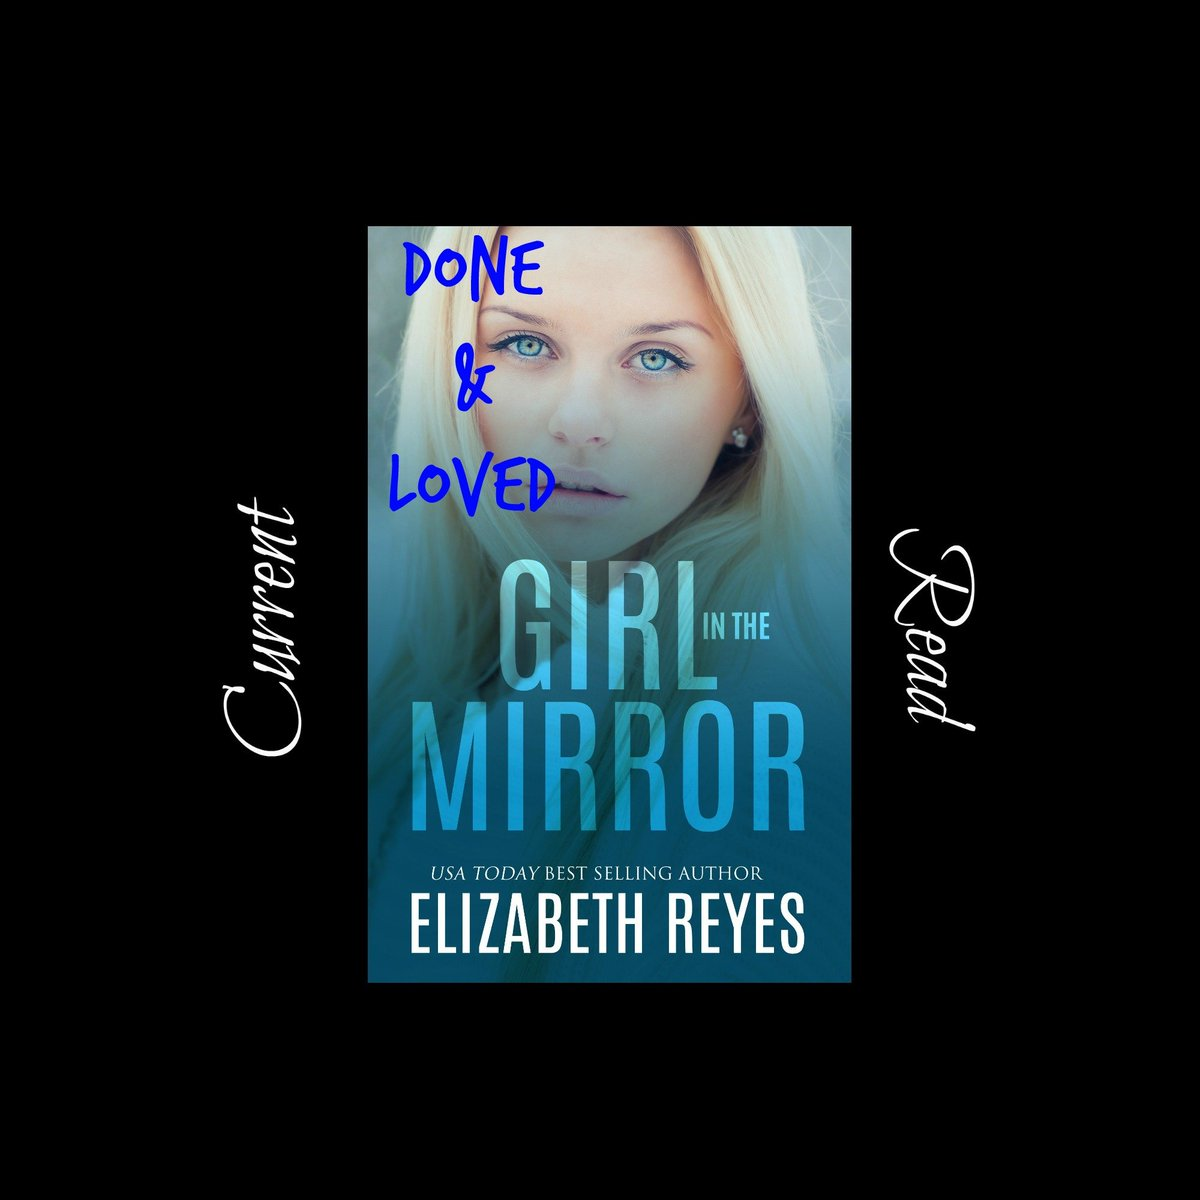 Buy:  http:// mybook.to/GirlintheMirro rER &nbsp; … … Review:  http:// bit.ly/2n6B1PE  &nbsp;   #romanticthriller #twist #reyes #giveaway<br>http://pic.twitter.com/SJ9eNdUgux